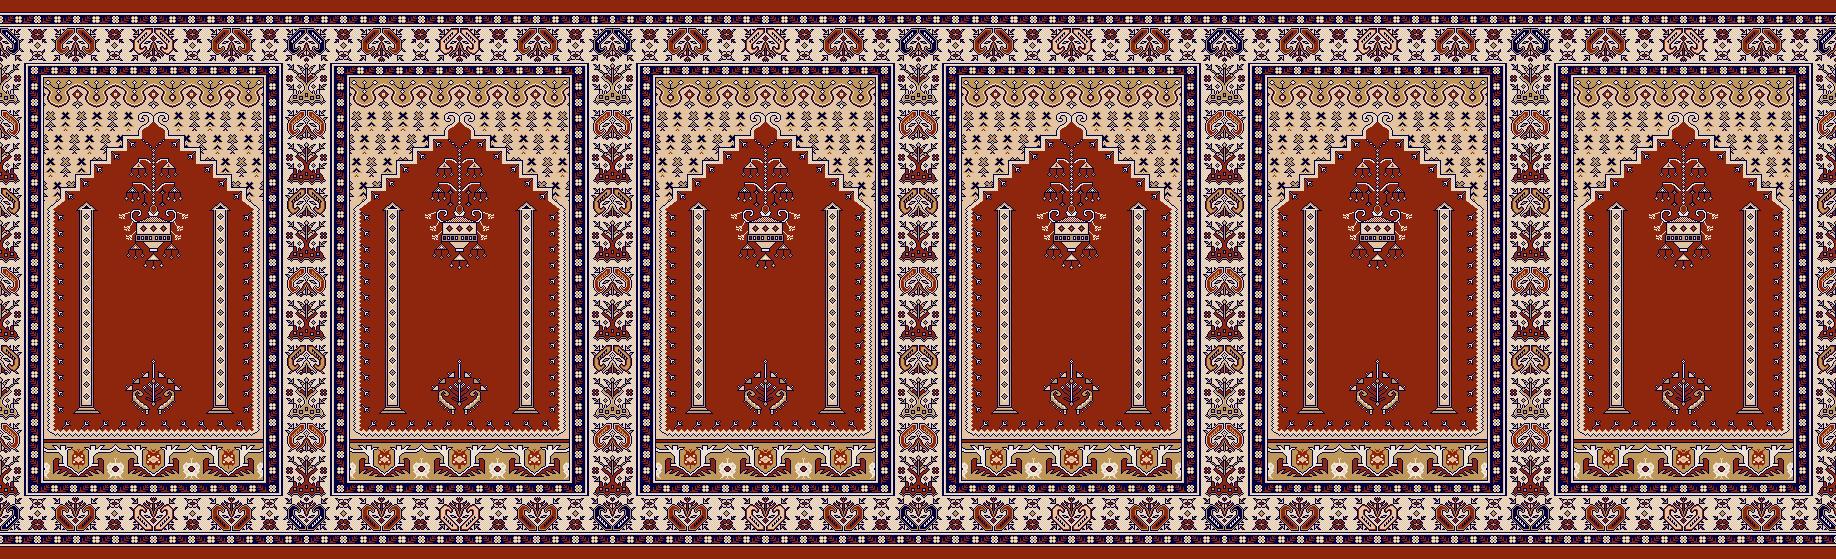 S143_kiremit